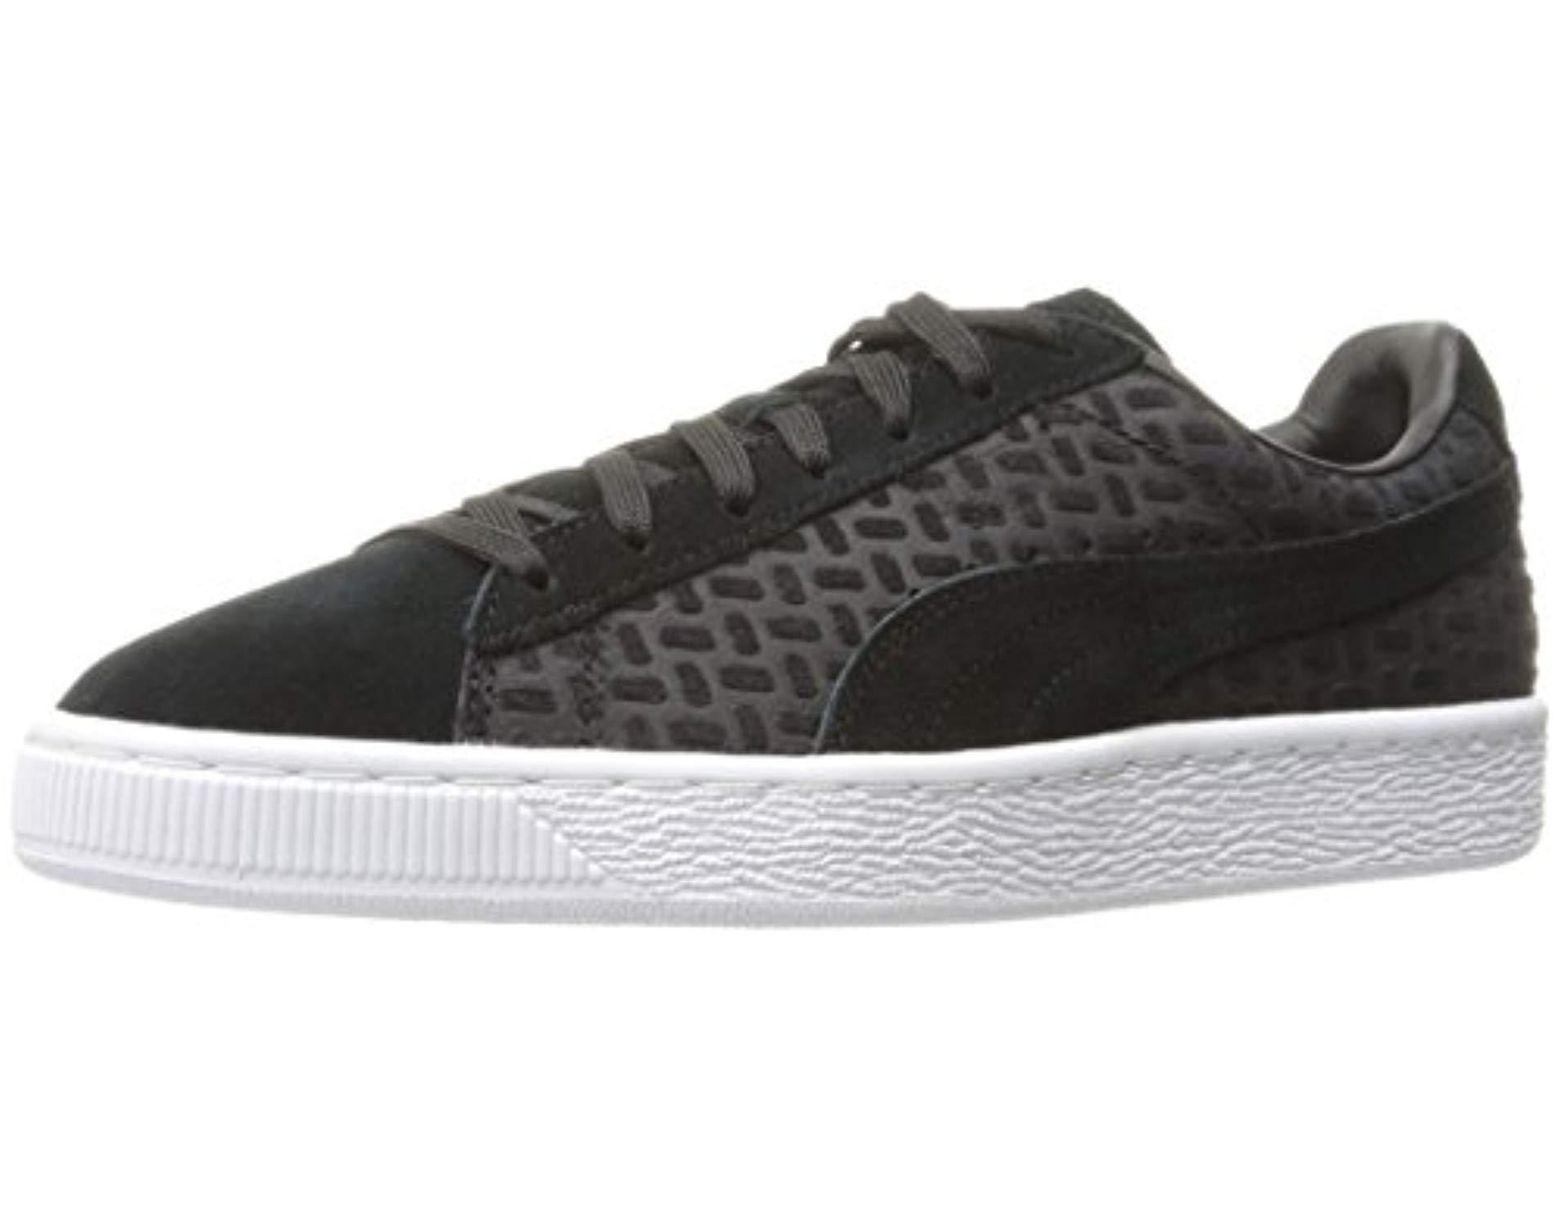 Lyst PUMA Suede Classic Emboss V2 Fashion Sneaker in Black